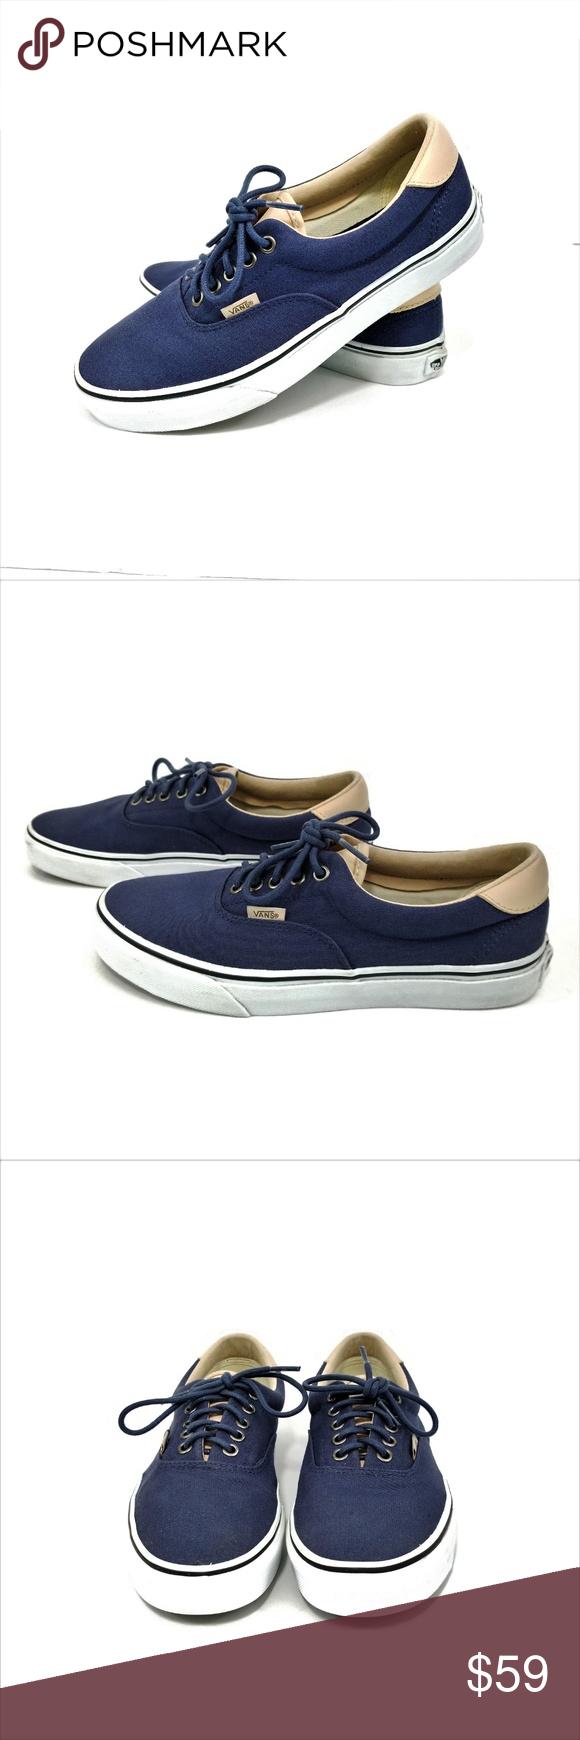 6e0a0ff0114 HOST PICK!!! Vans Navy Era 59 Sneakers Skate Shoes Vans Era 59 ...